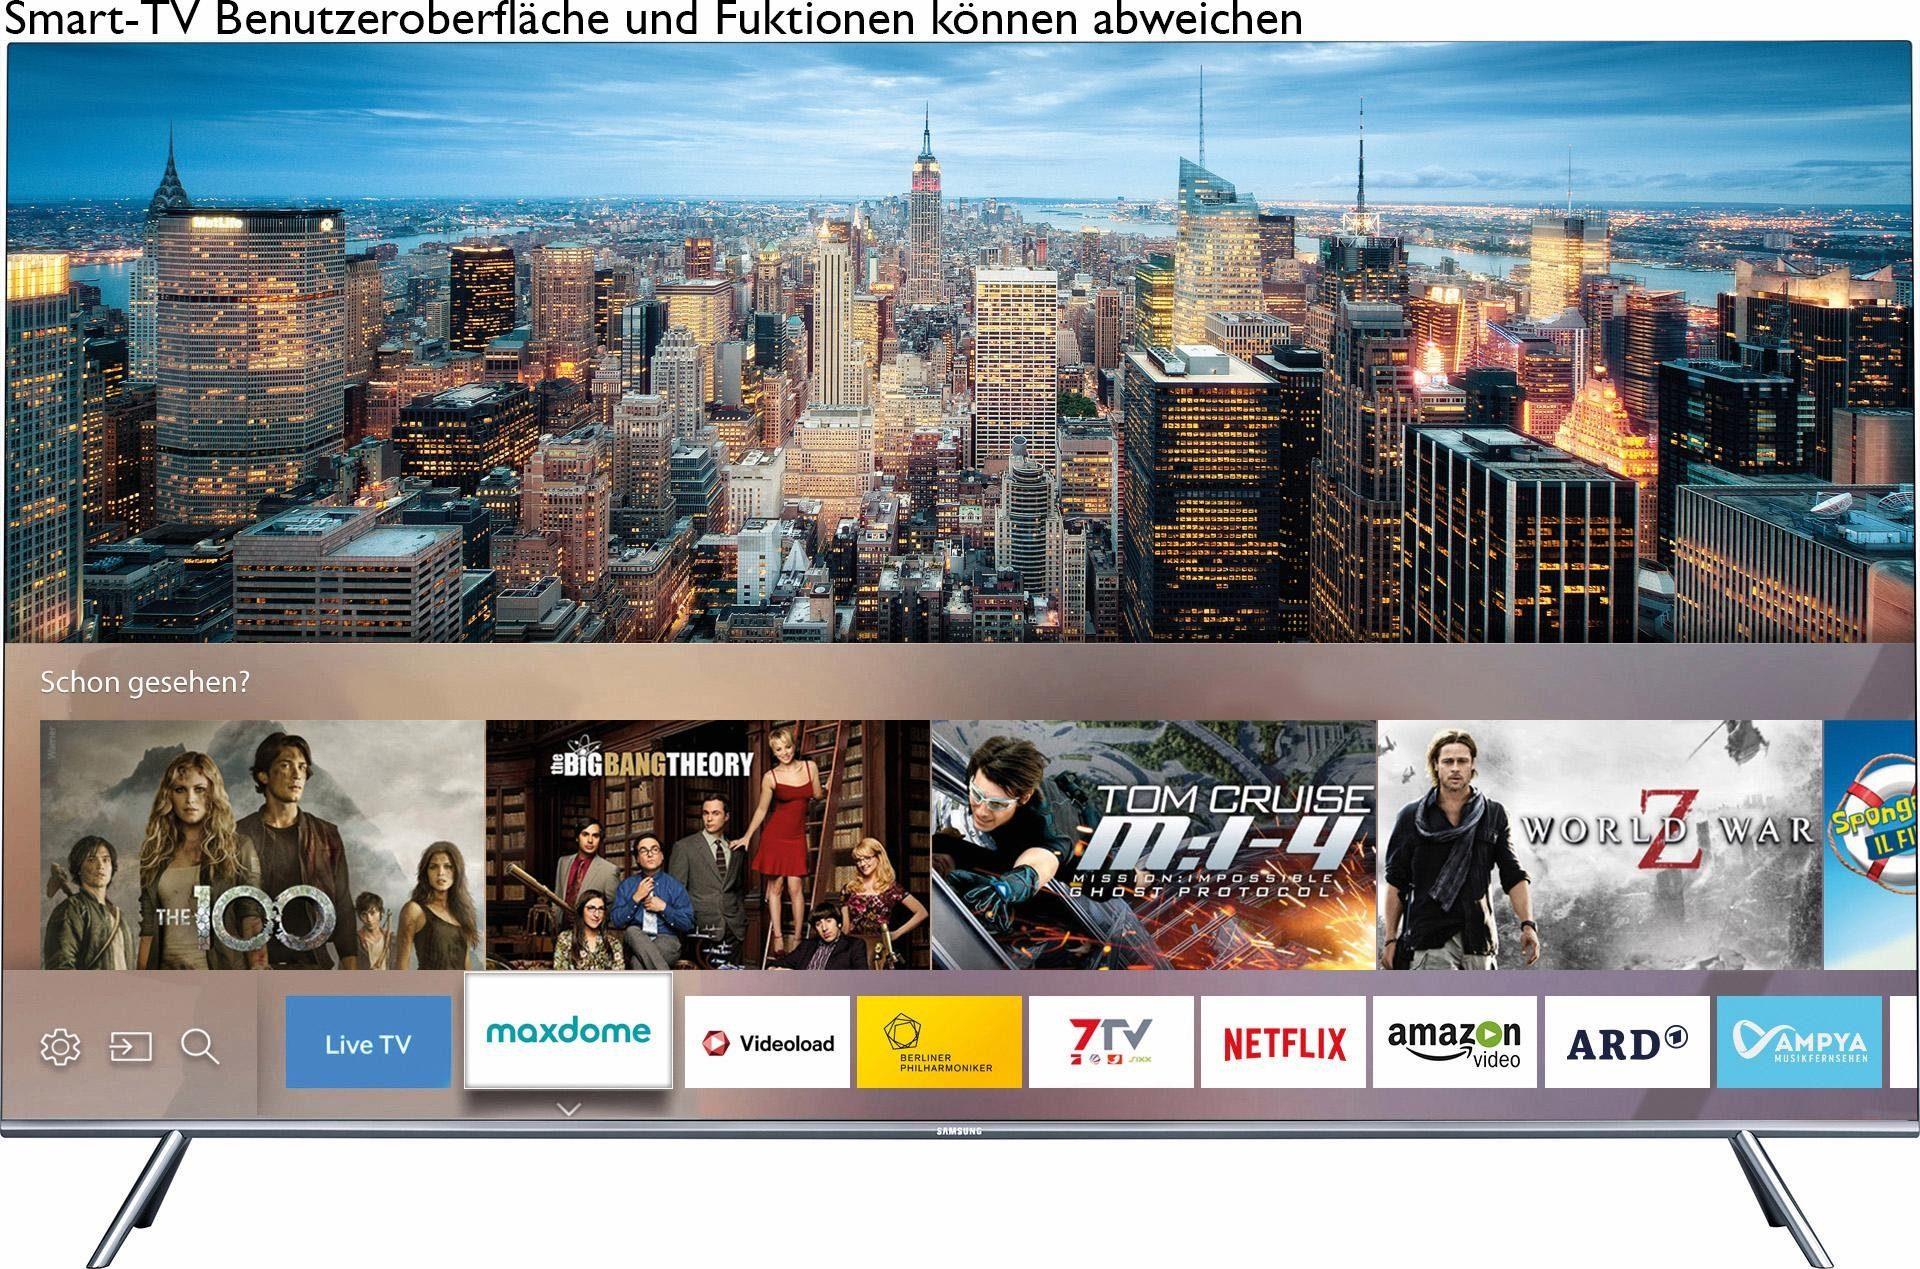 Samsung UE49KS7590UXZG, Curved-LED-Fernseher, 123 cm (49 Zoll), 2160p (SUHD), Smart-TV